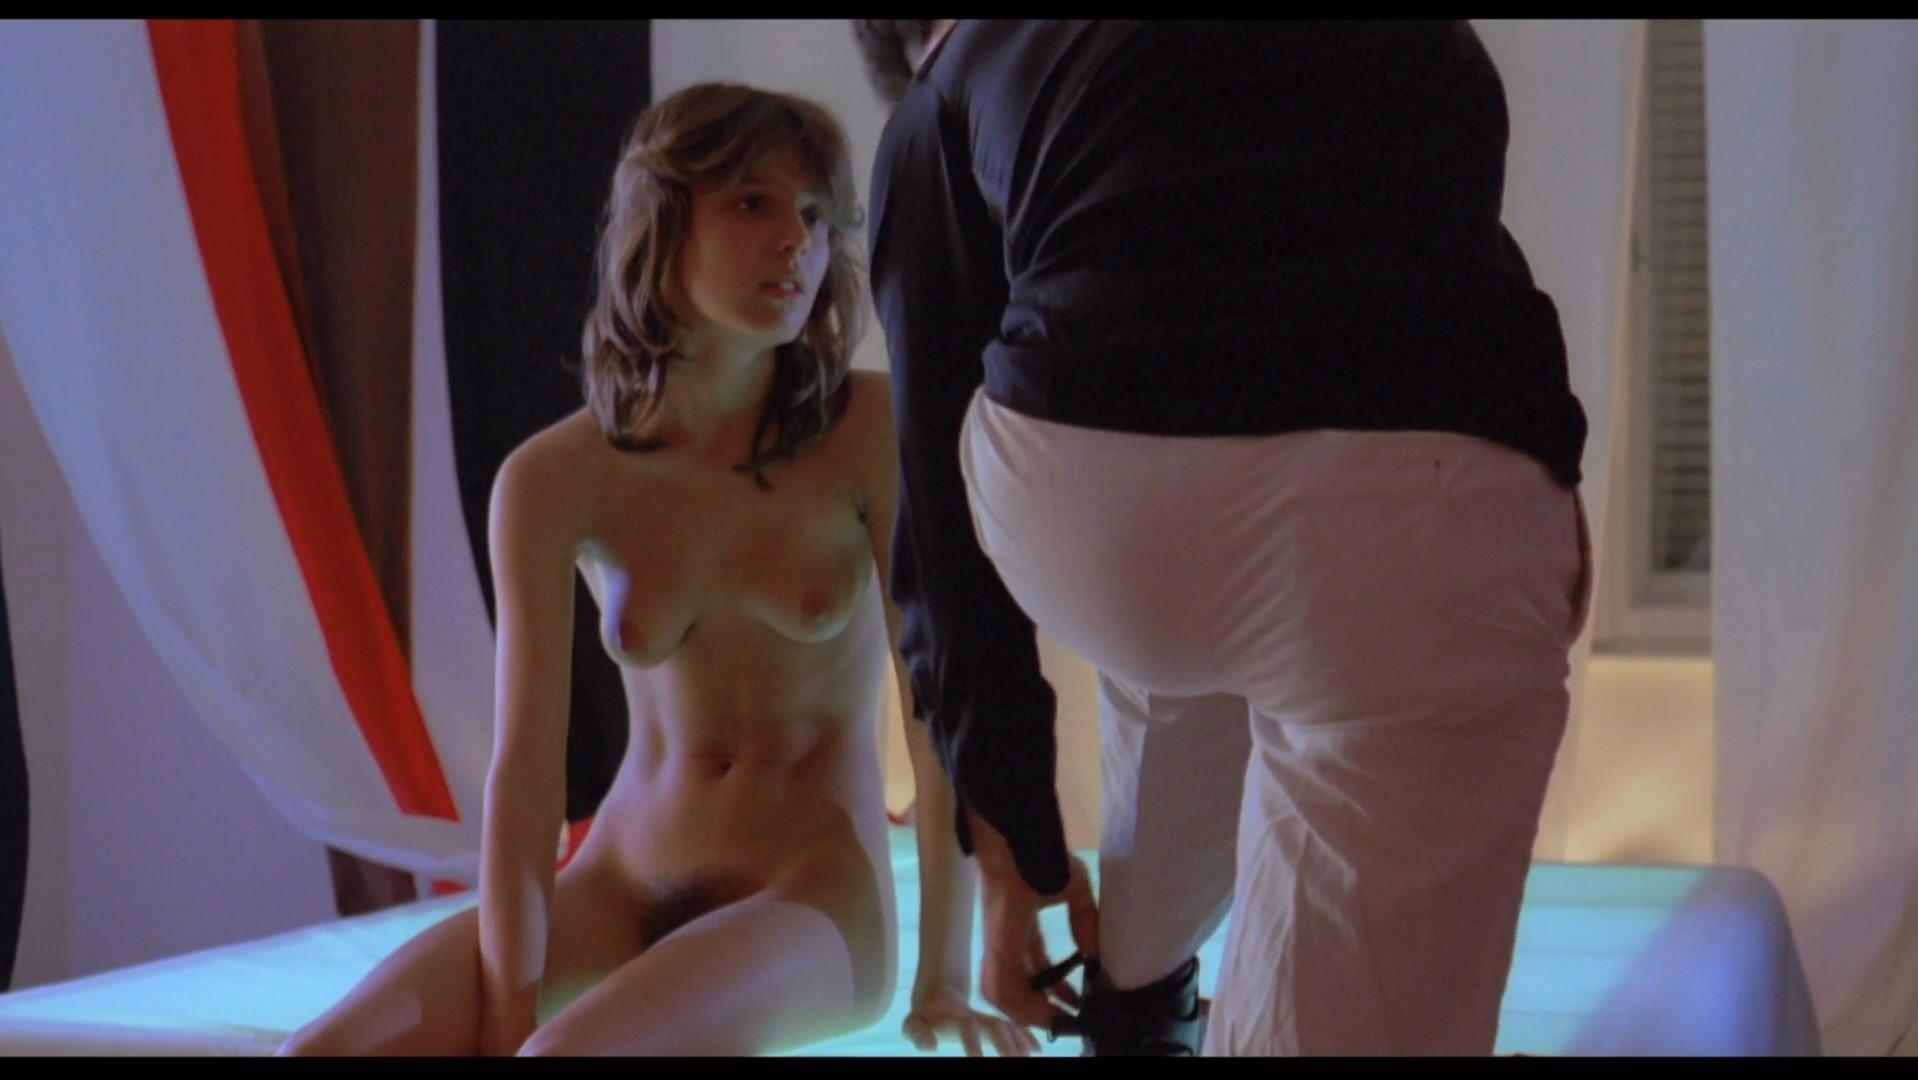 Celeb nackt Film Bewertung